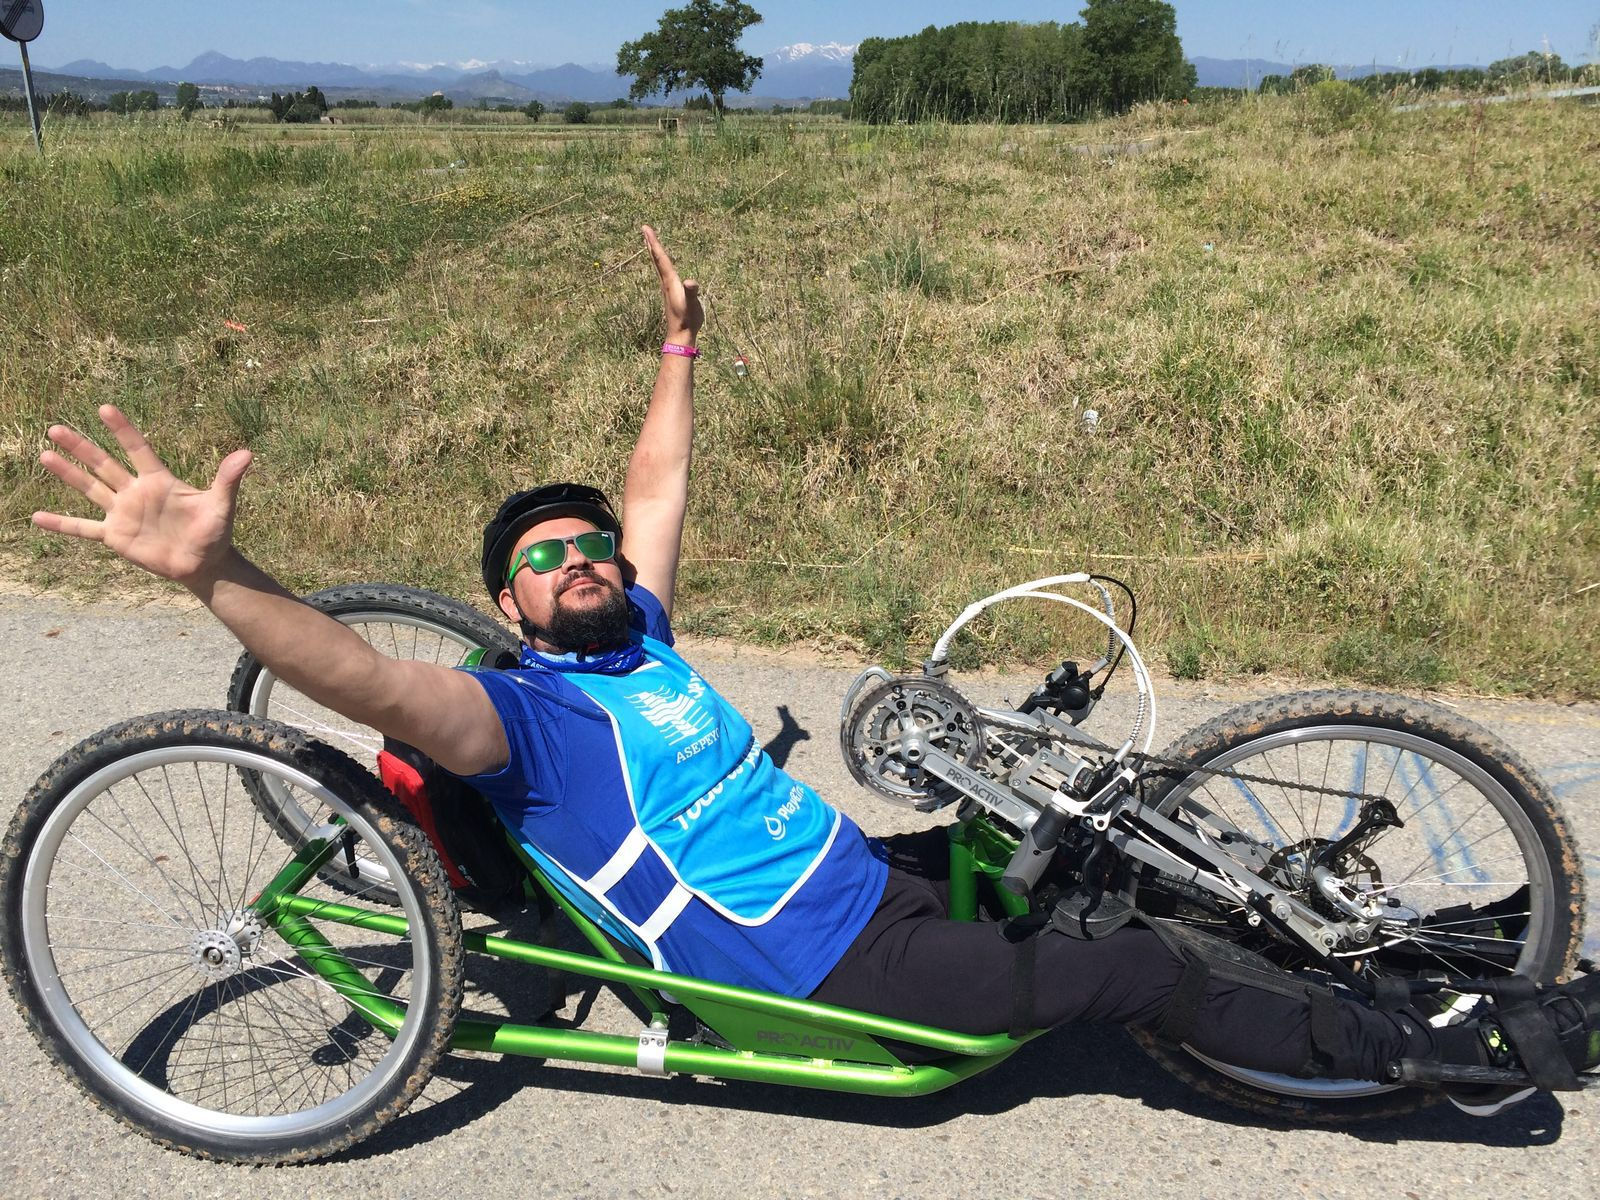 Descubriendo el Empordà en bicicleta